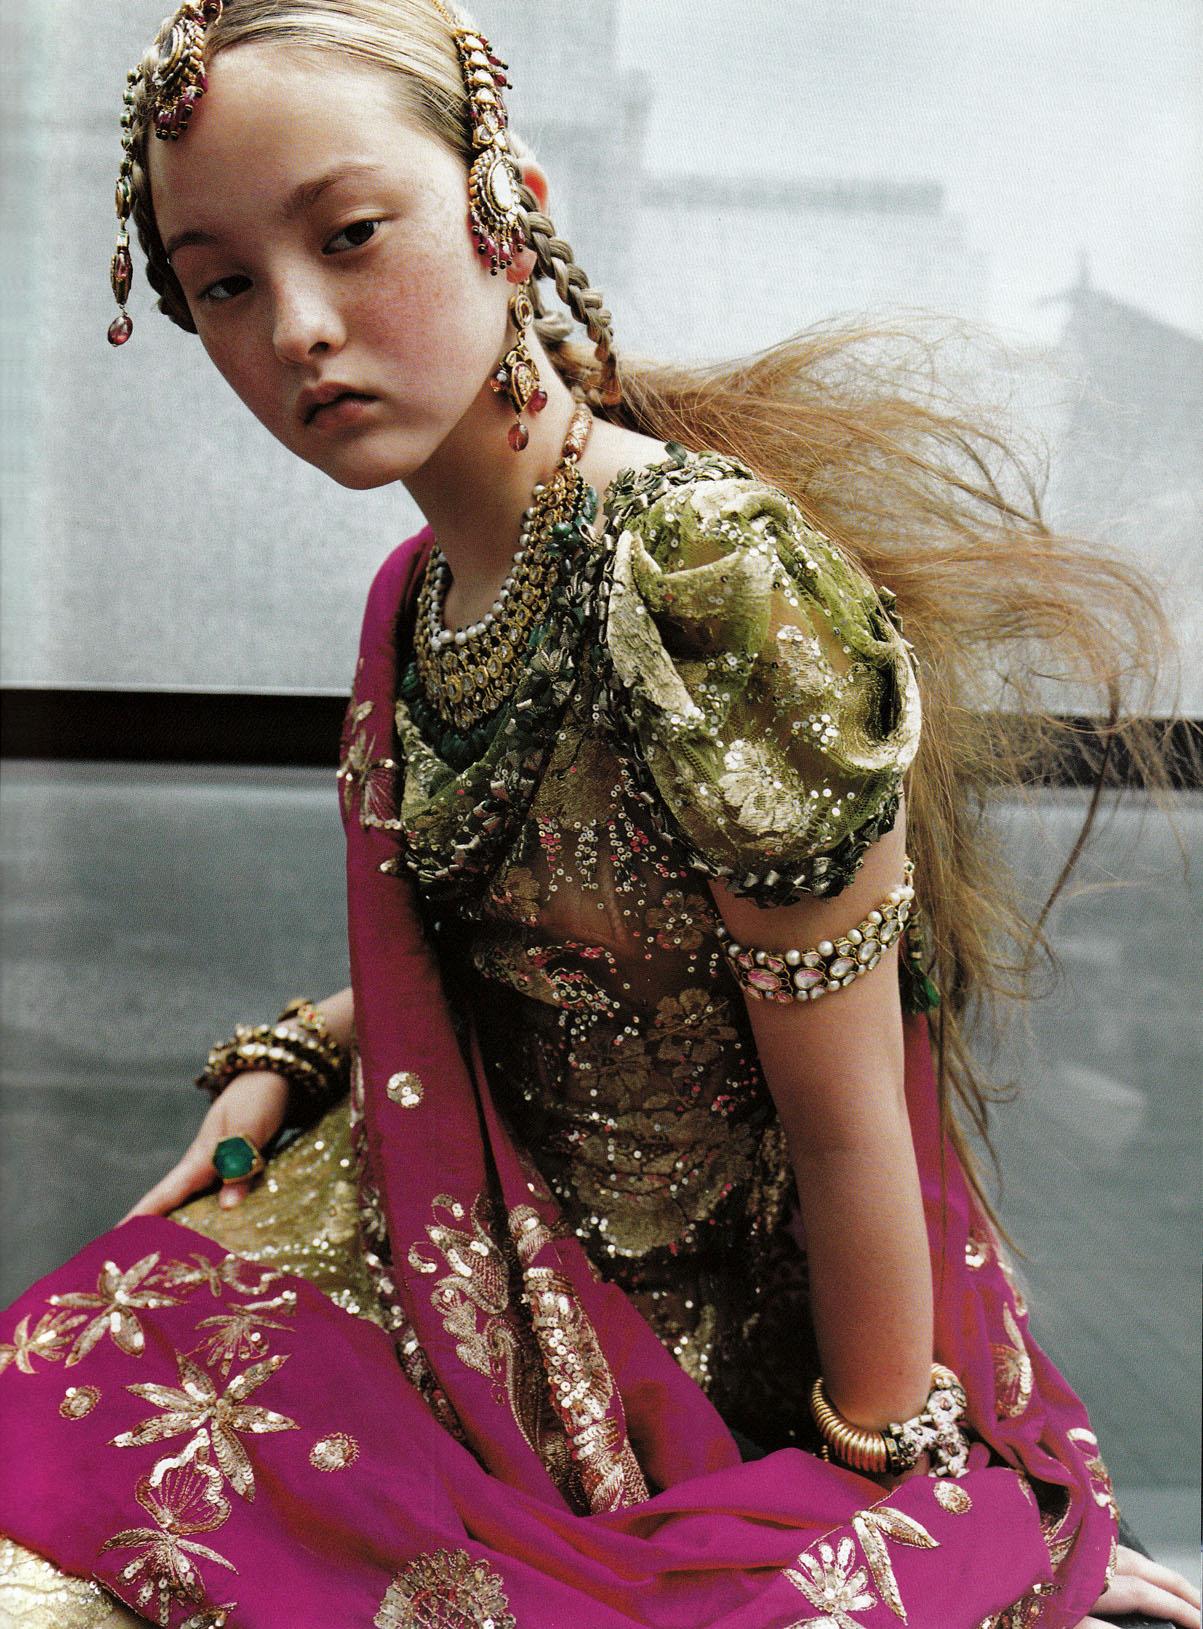 Devon Aoki by  Ruven Afanador for   Vogue  Paris, September 1999.